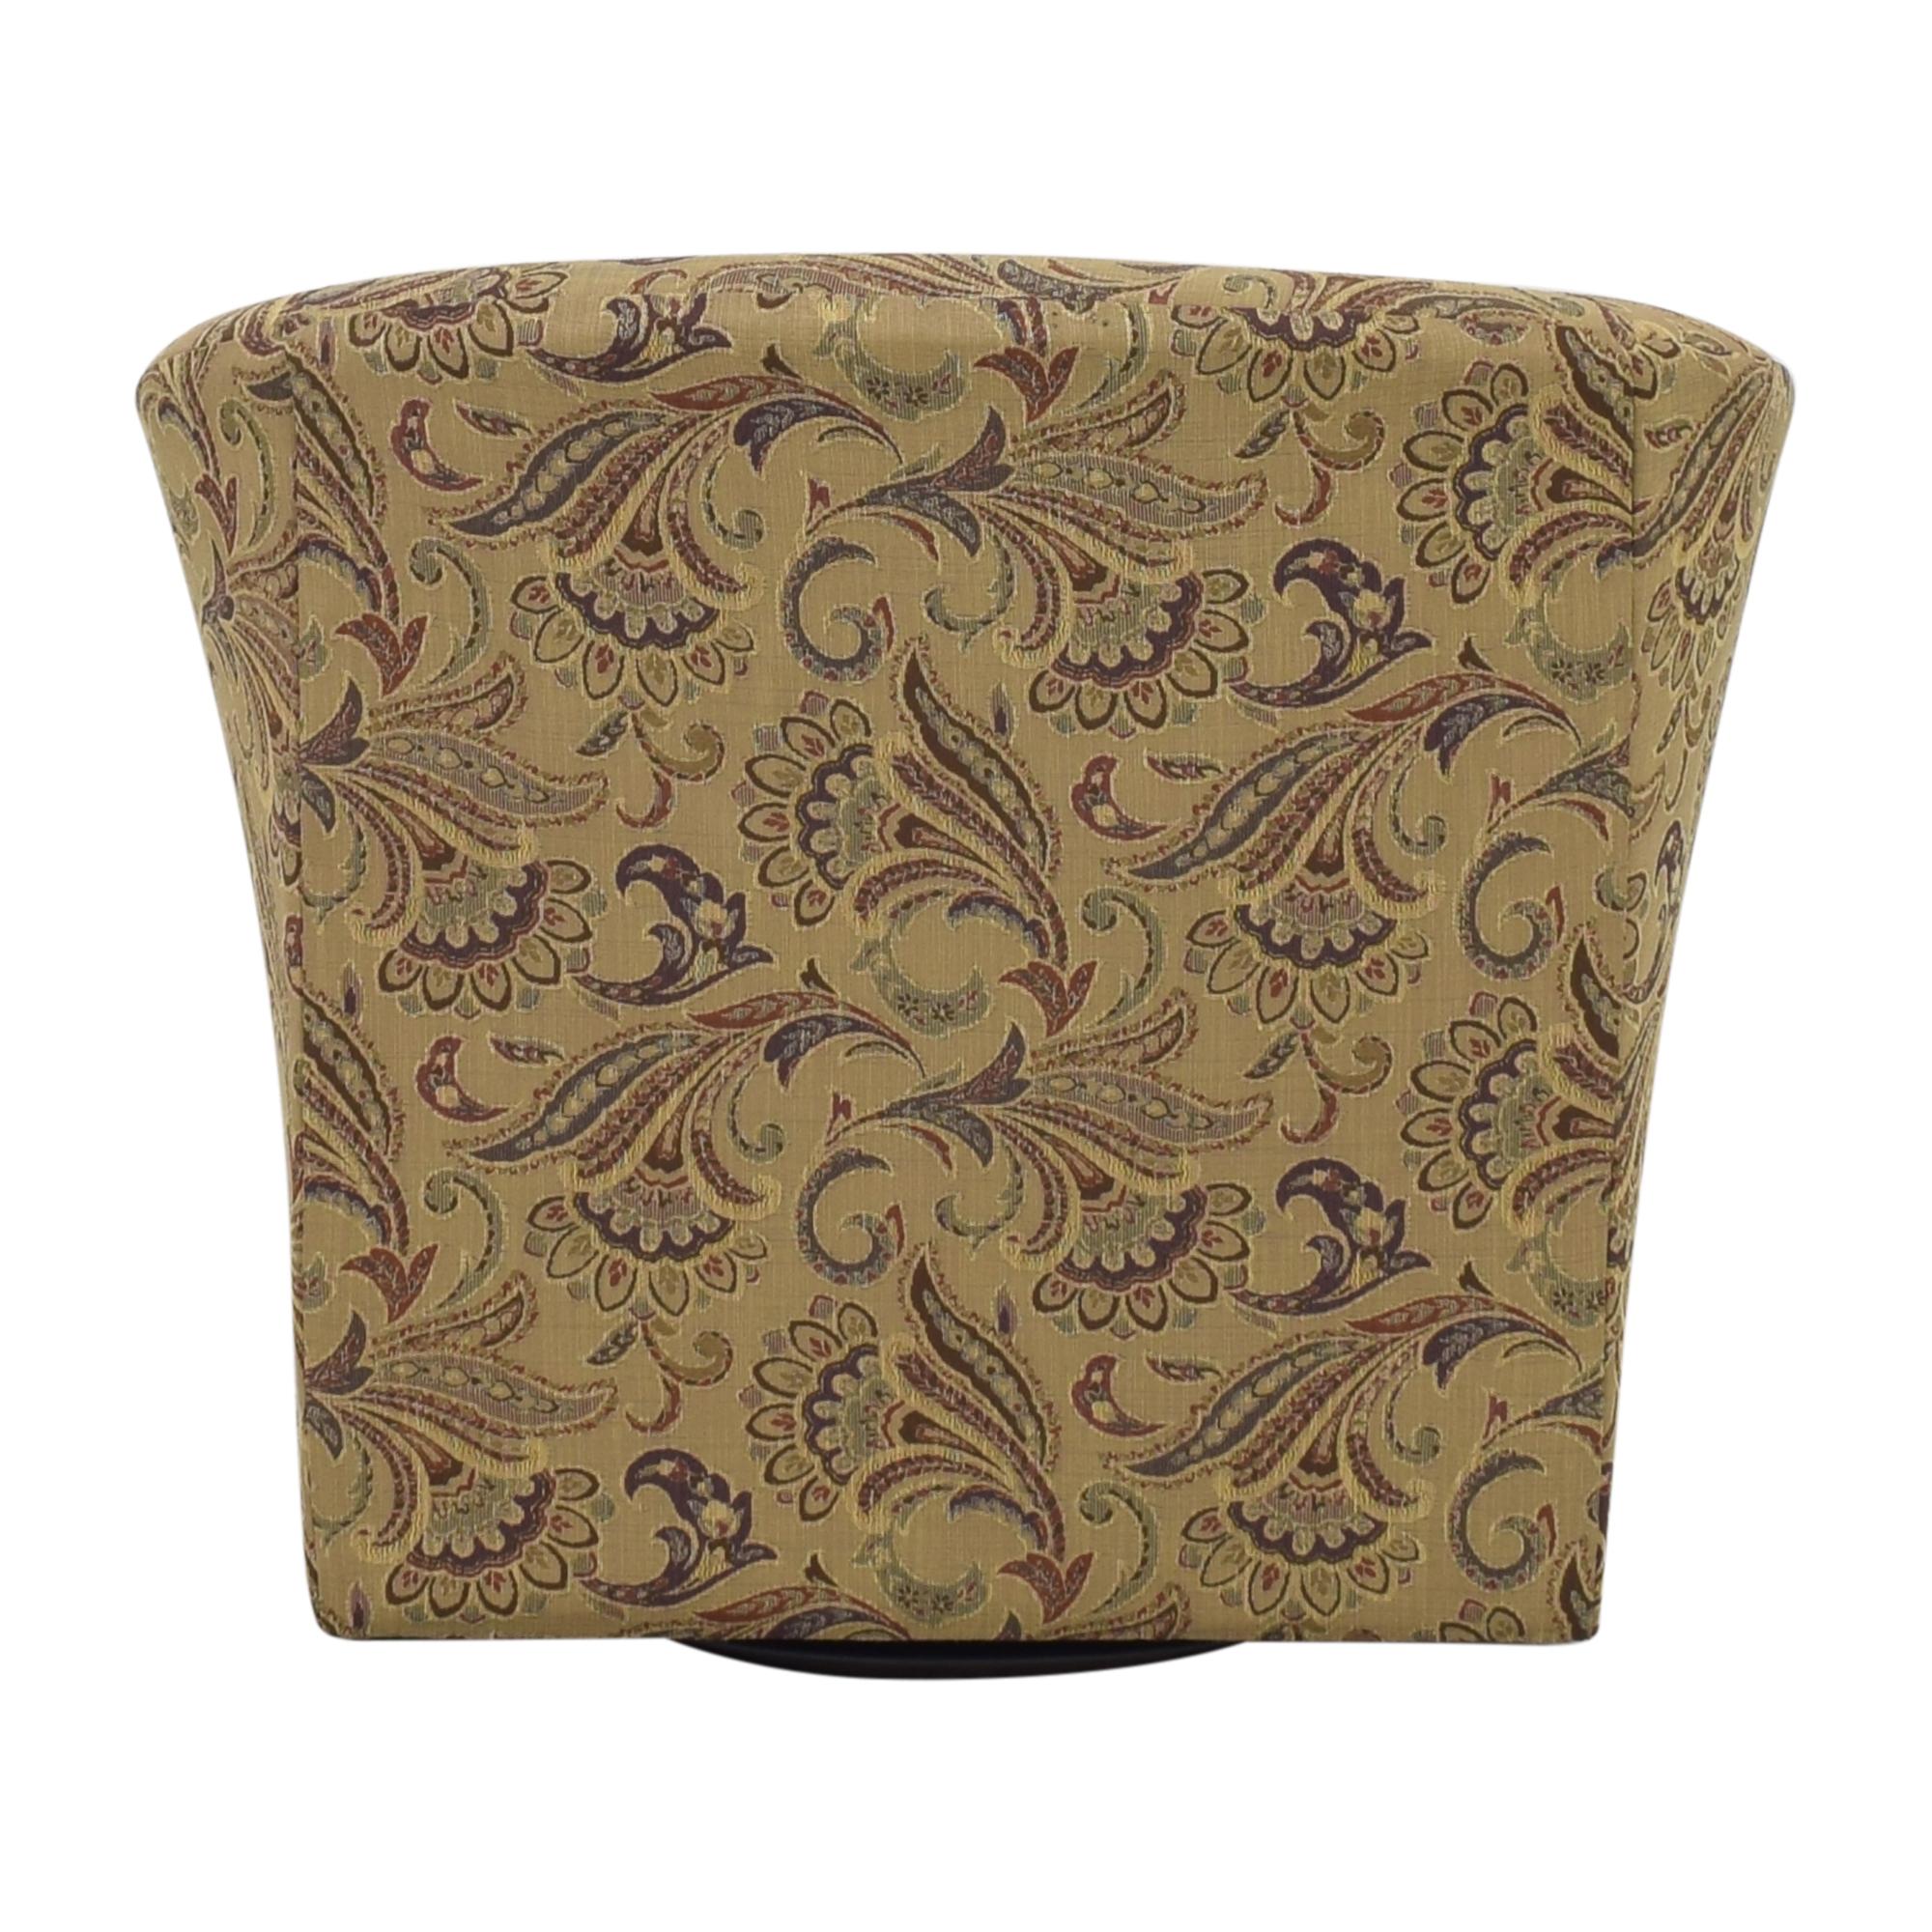 Hooker Furniture Hooker Furniture Sam Moore Swivel Accent Chair ct